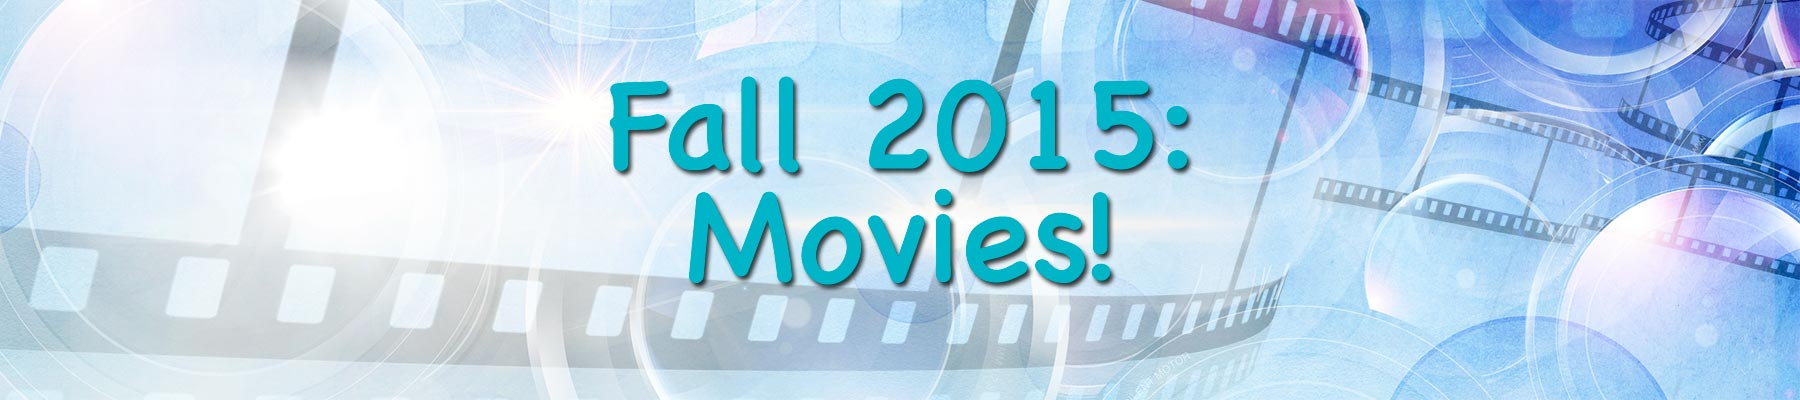 Fall 2015: Movie Screening!